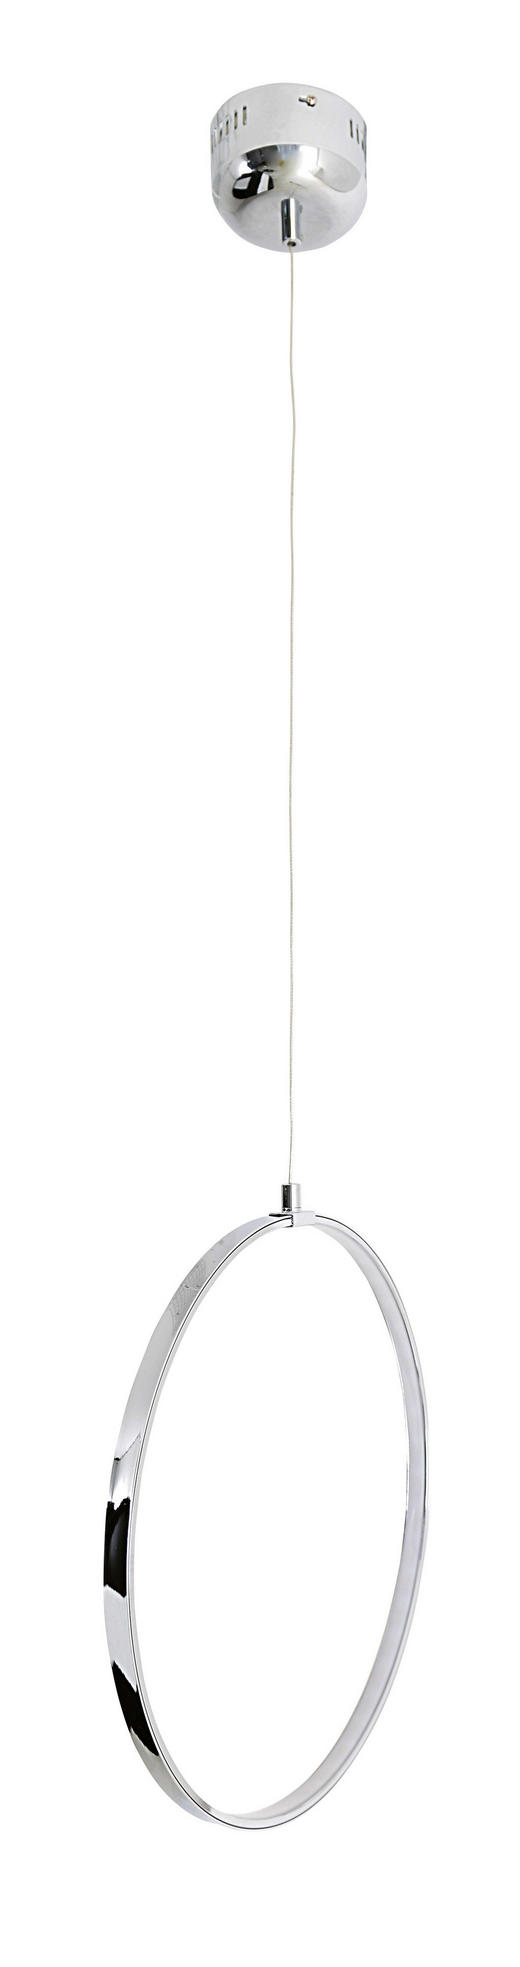 LED-HÄNGELEUCHTE - Chromfarben, LIFESTYLE, Metall (80/120cm)